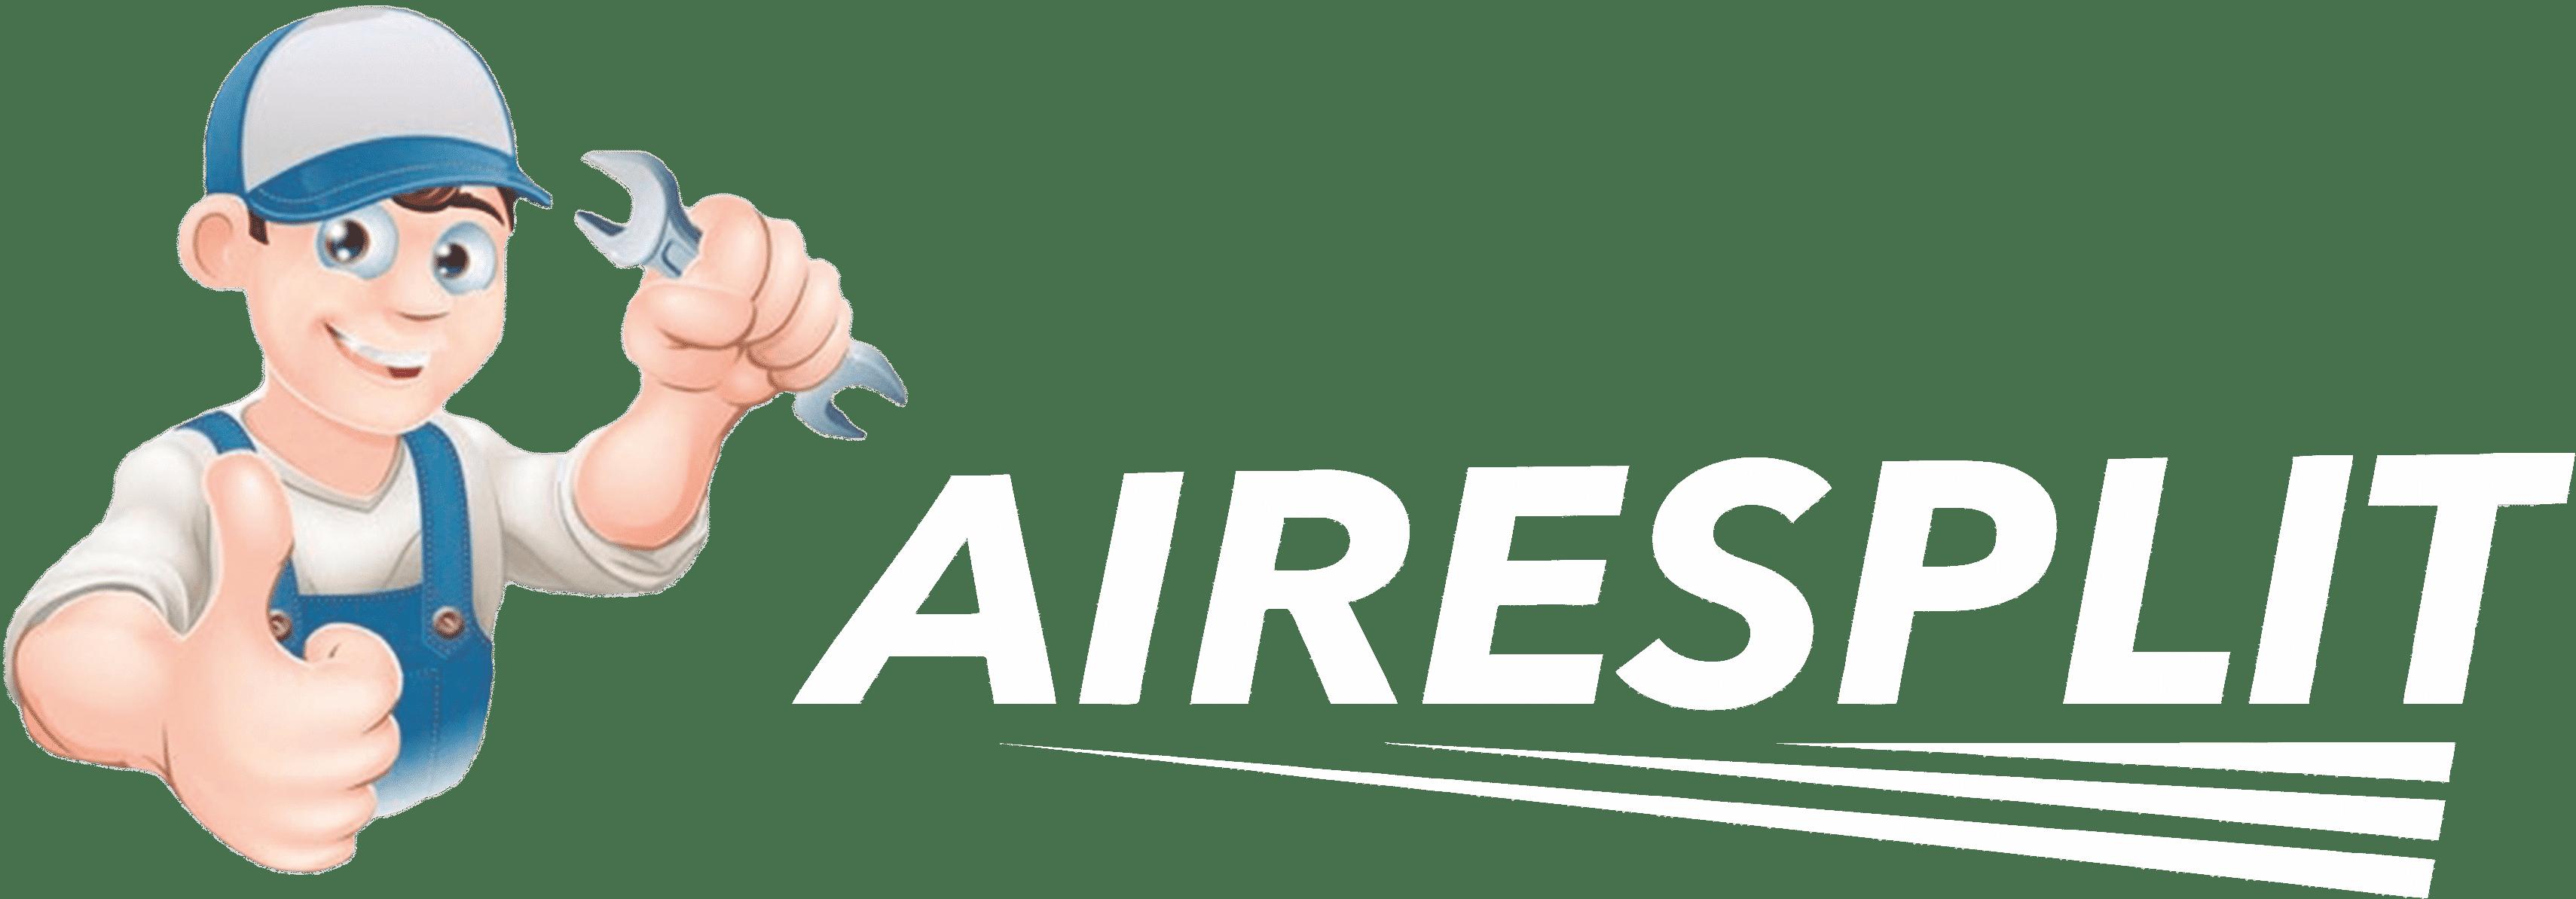 Airesplit